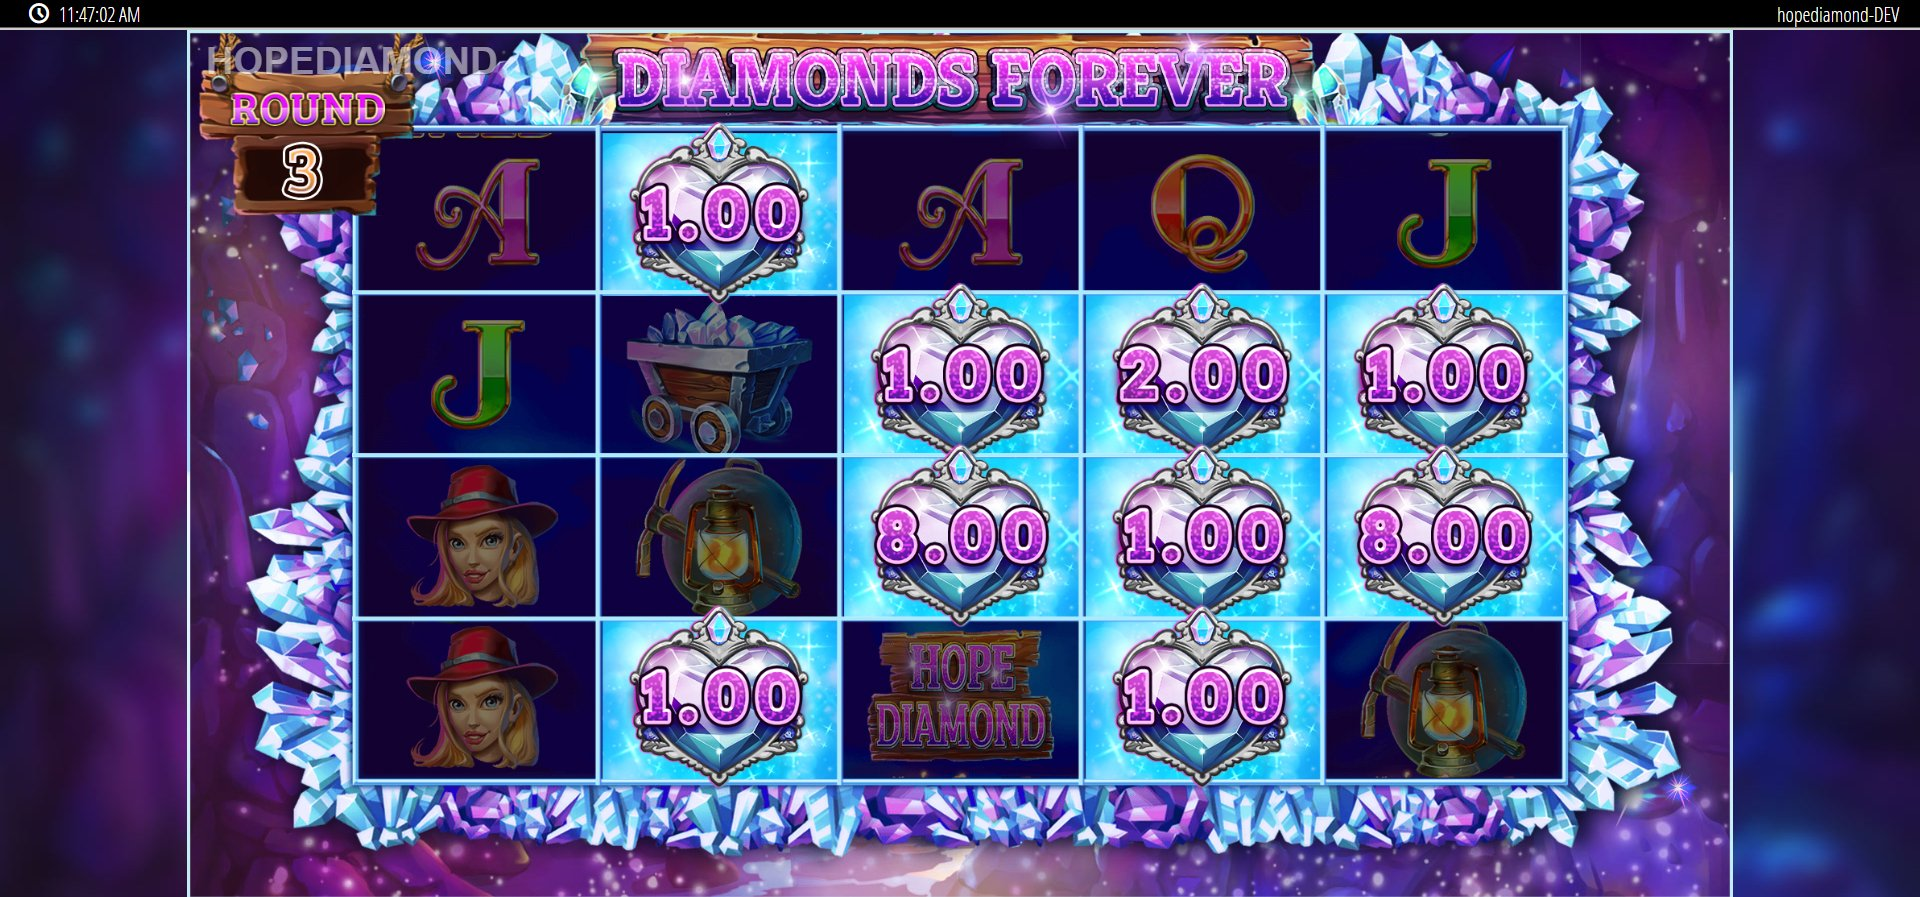 Blueprint Gaming Release Hope Diamond Slot